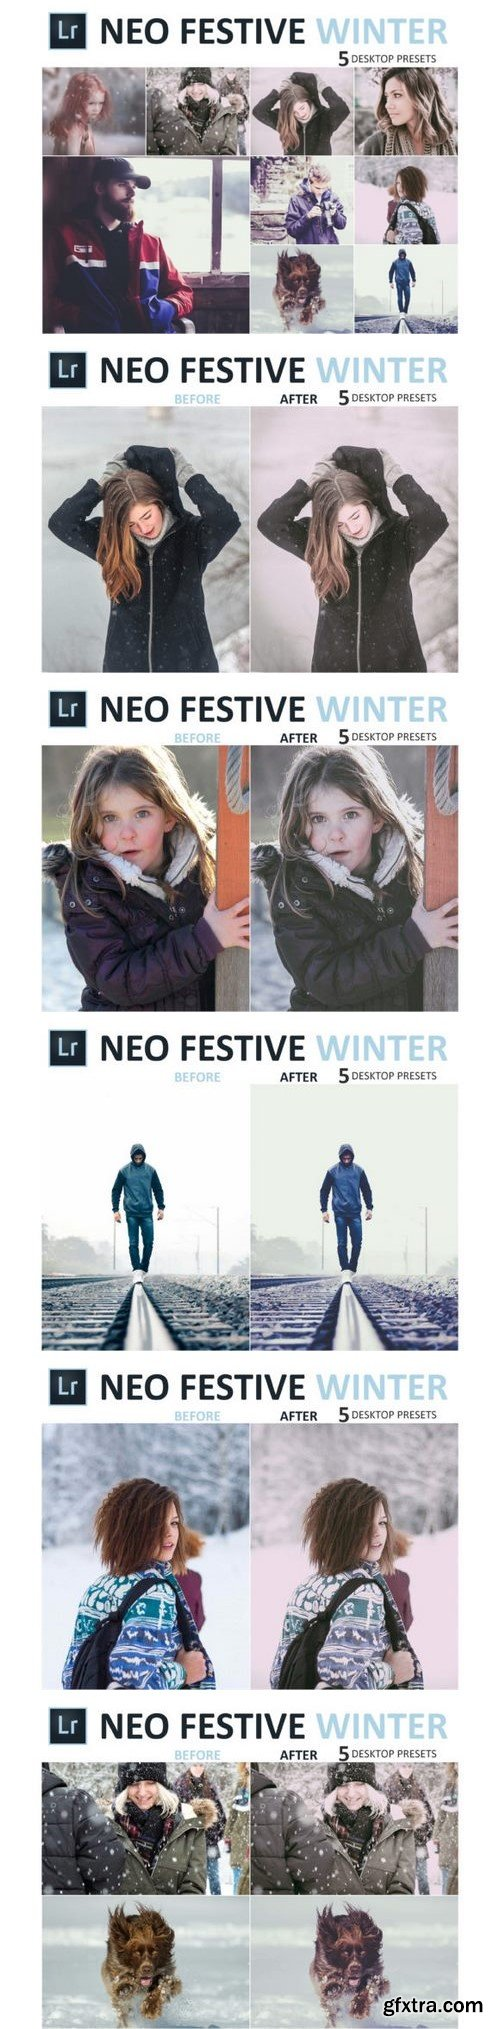 Thehungryjpeg - Neo Festive Winter Desktop Lightroom Presets 3524672